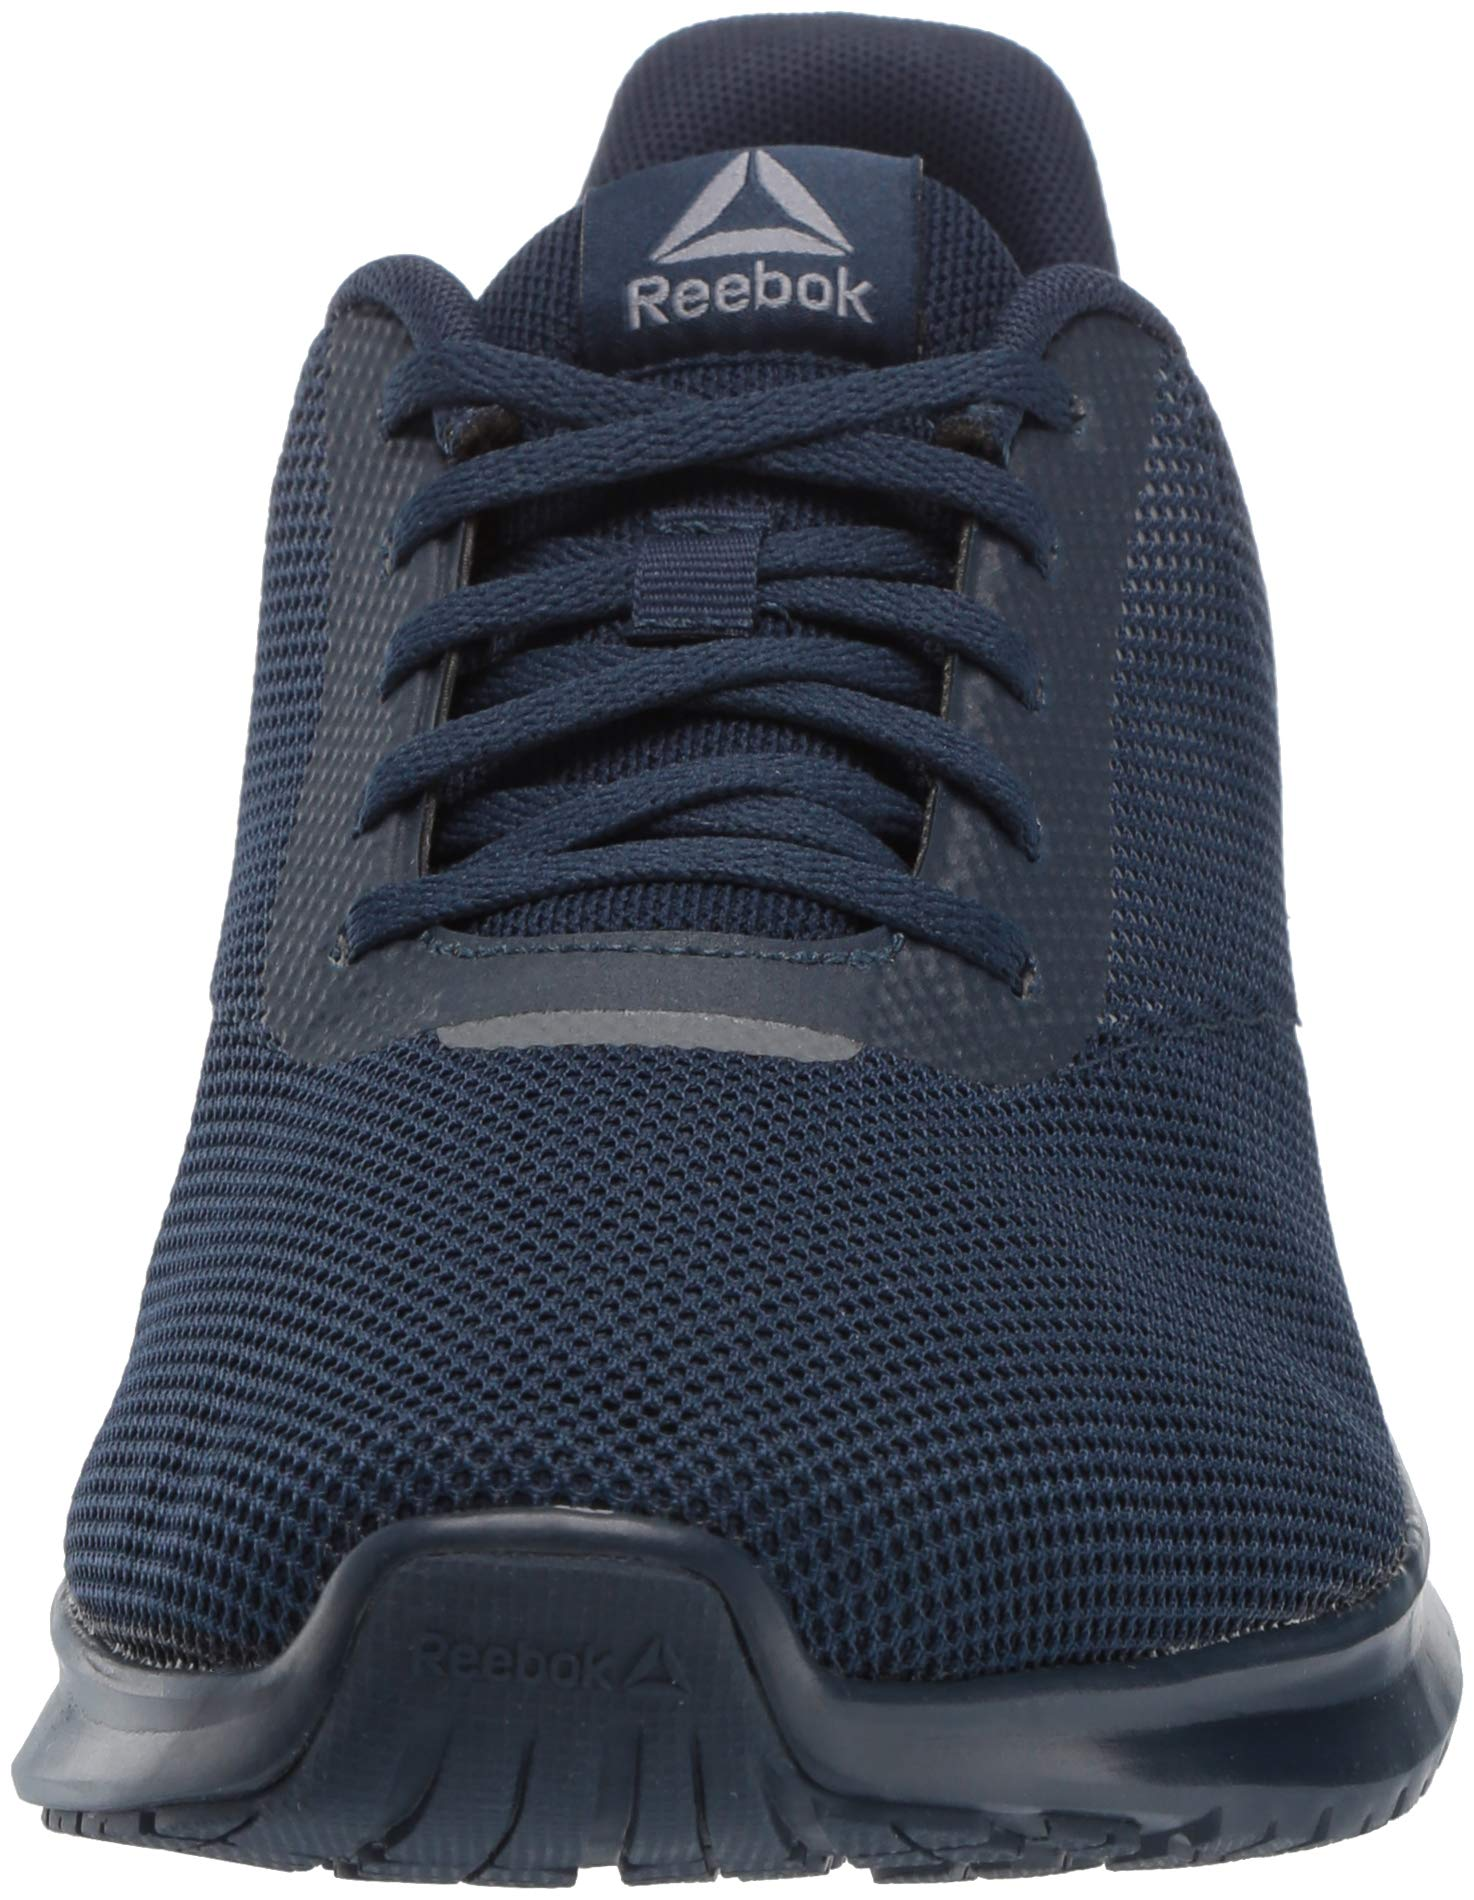 Reebok Men's Instalite Lux Running Shoe